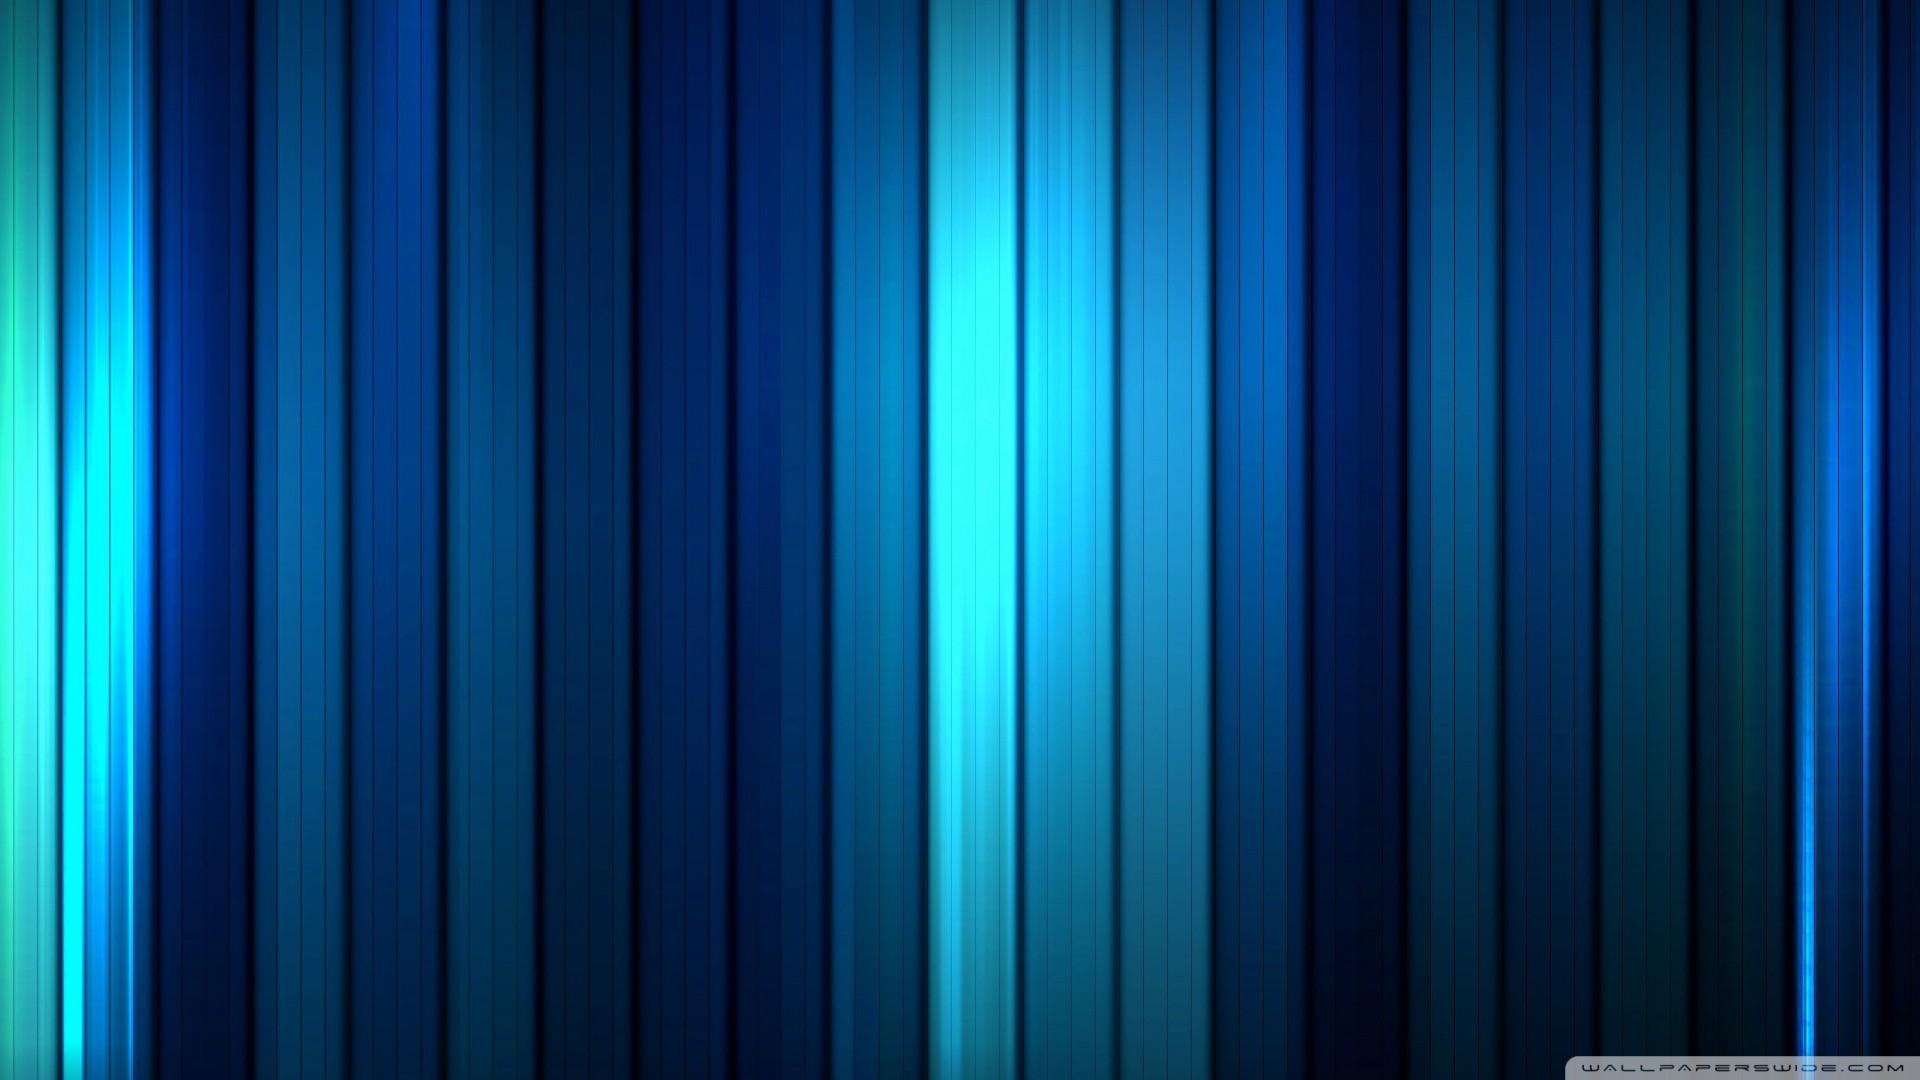 Motion Stripes Blue Wallpaper Motion, Stripes, Blue